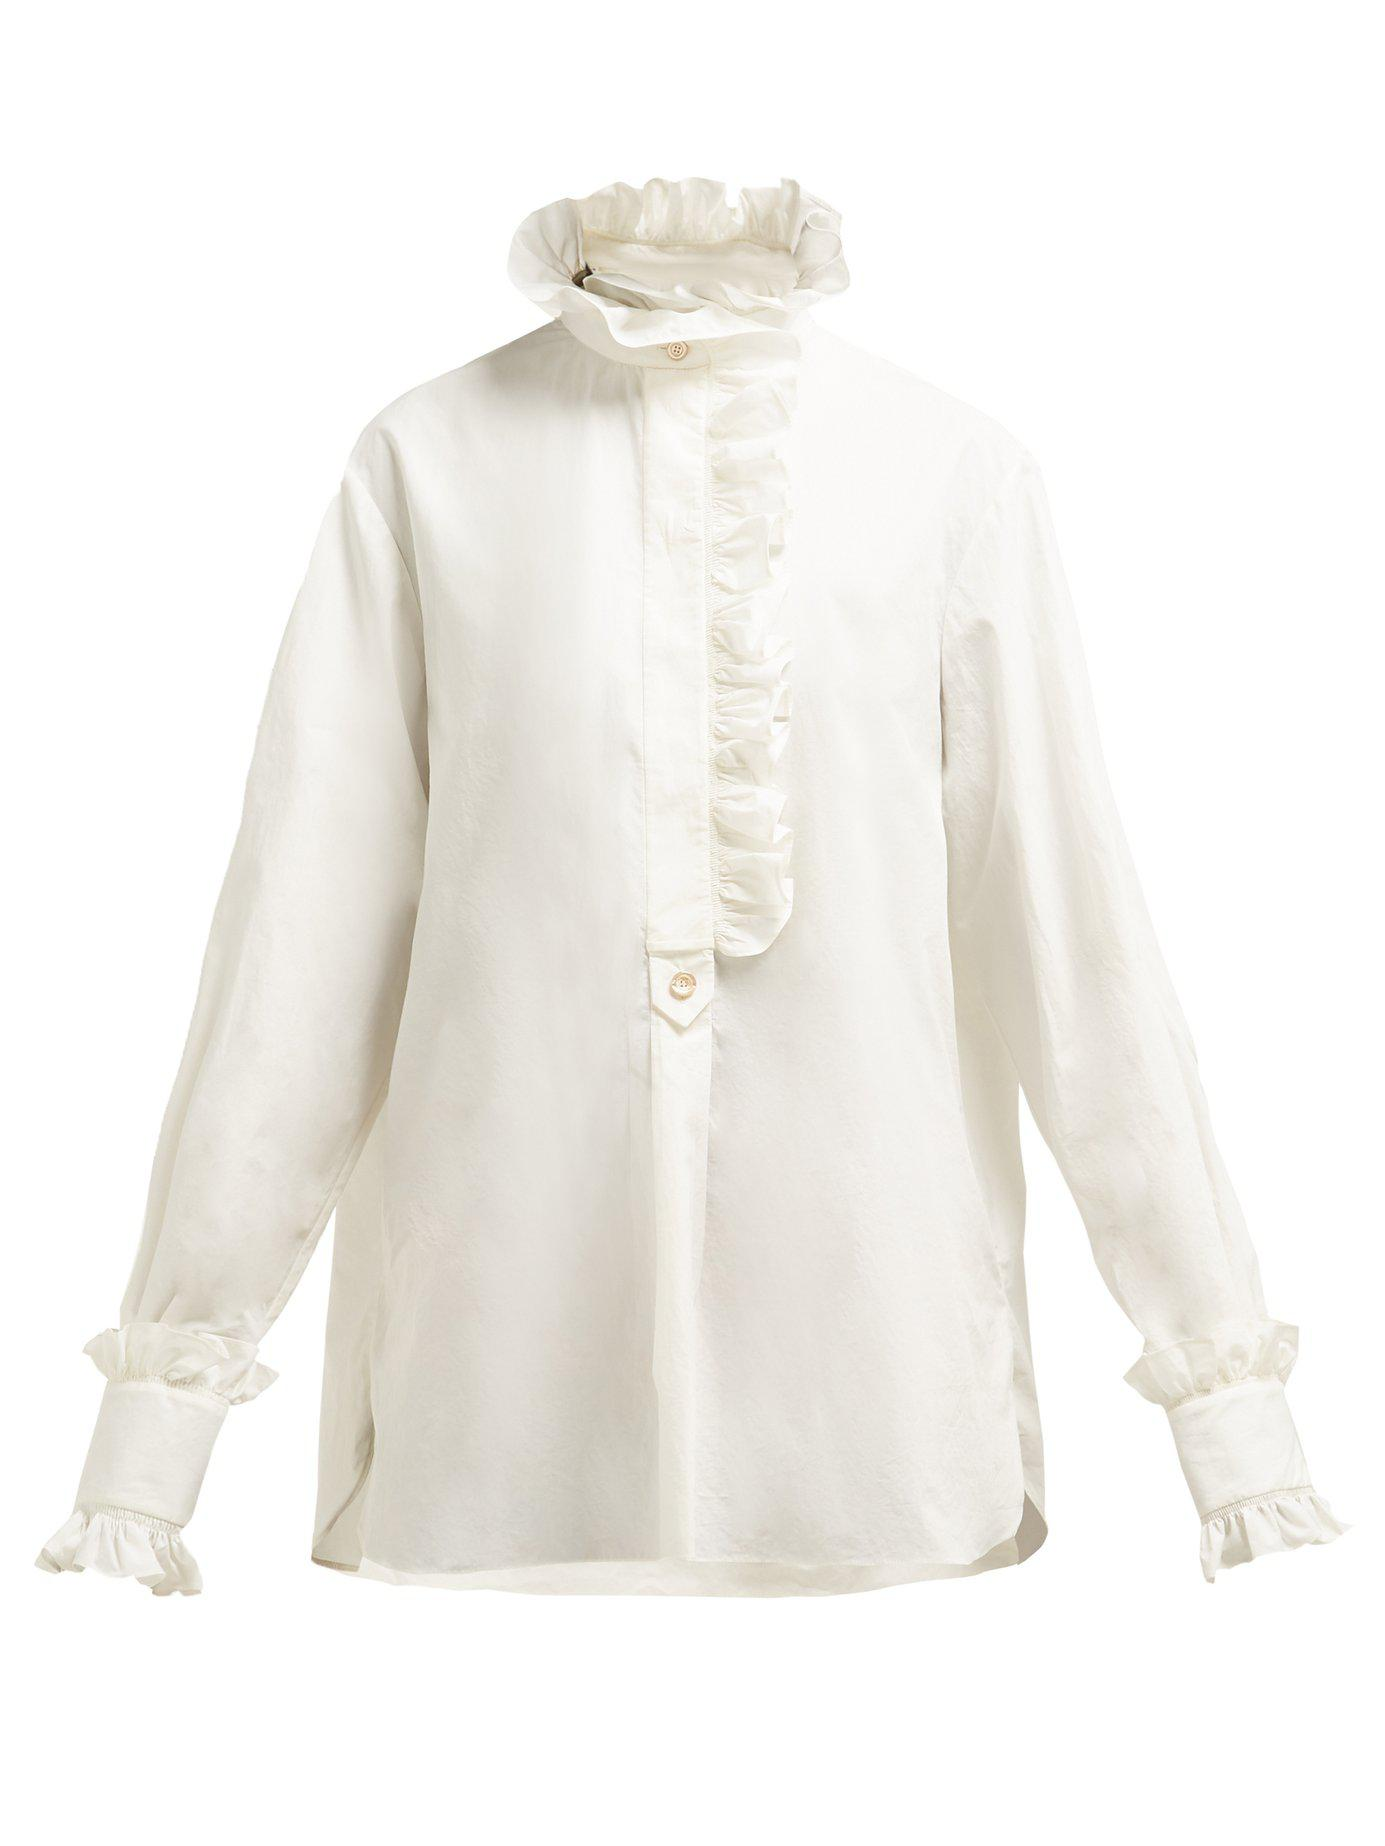 69cc04866d3 Lyst - Gucci Ruffled Cotton Poplin Shirt in White